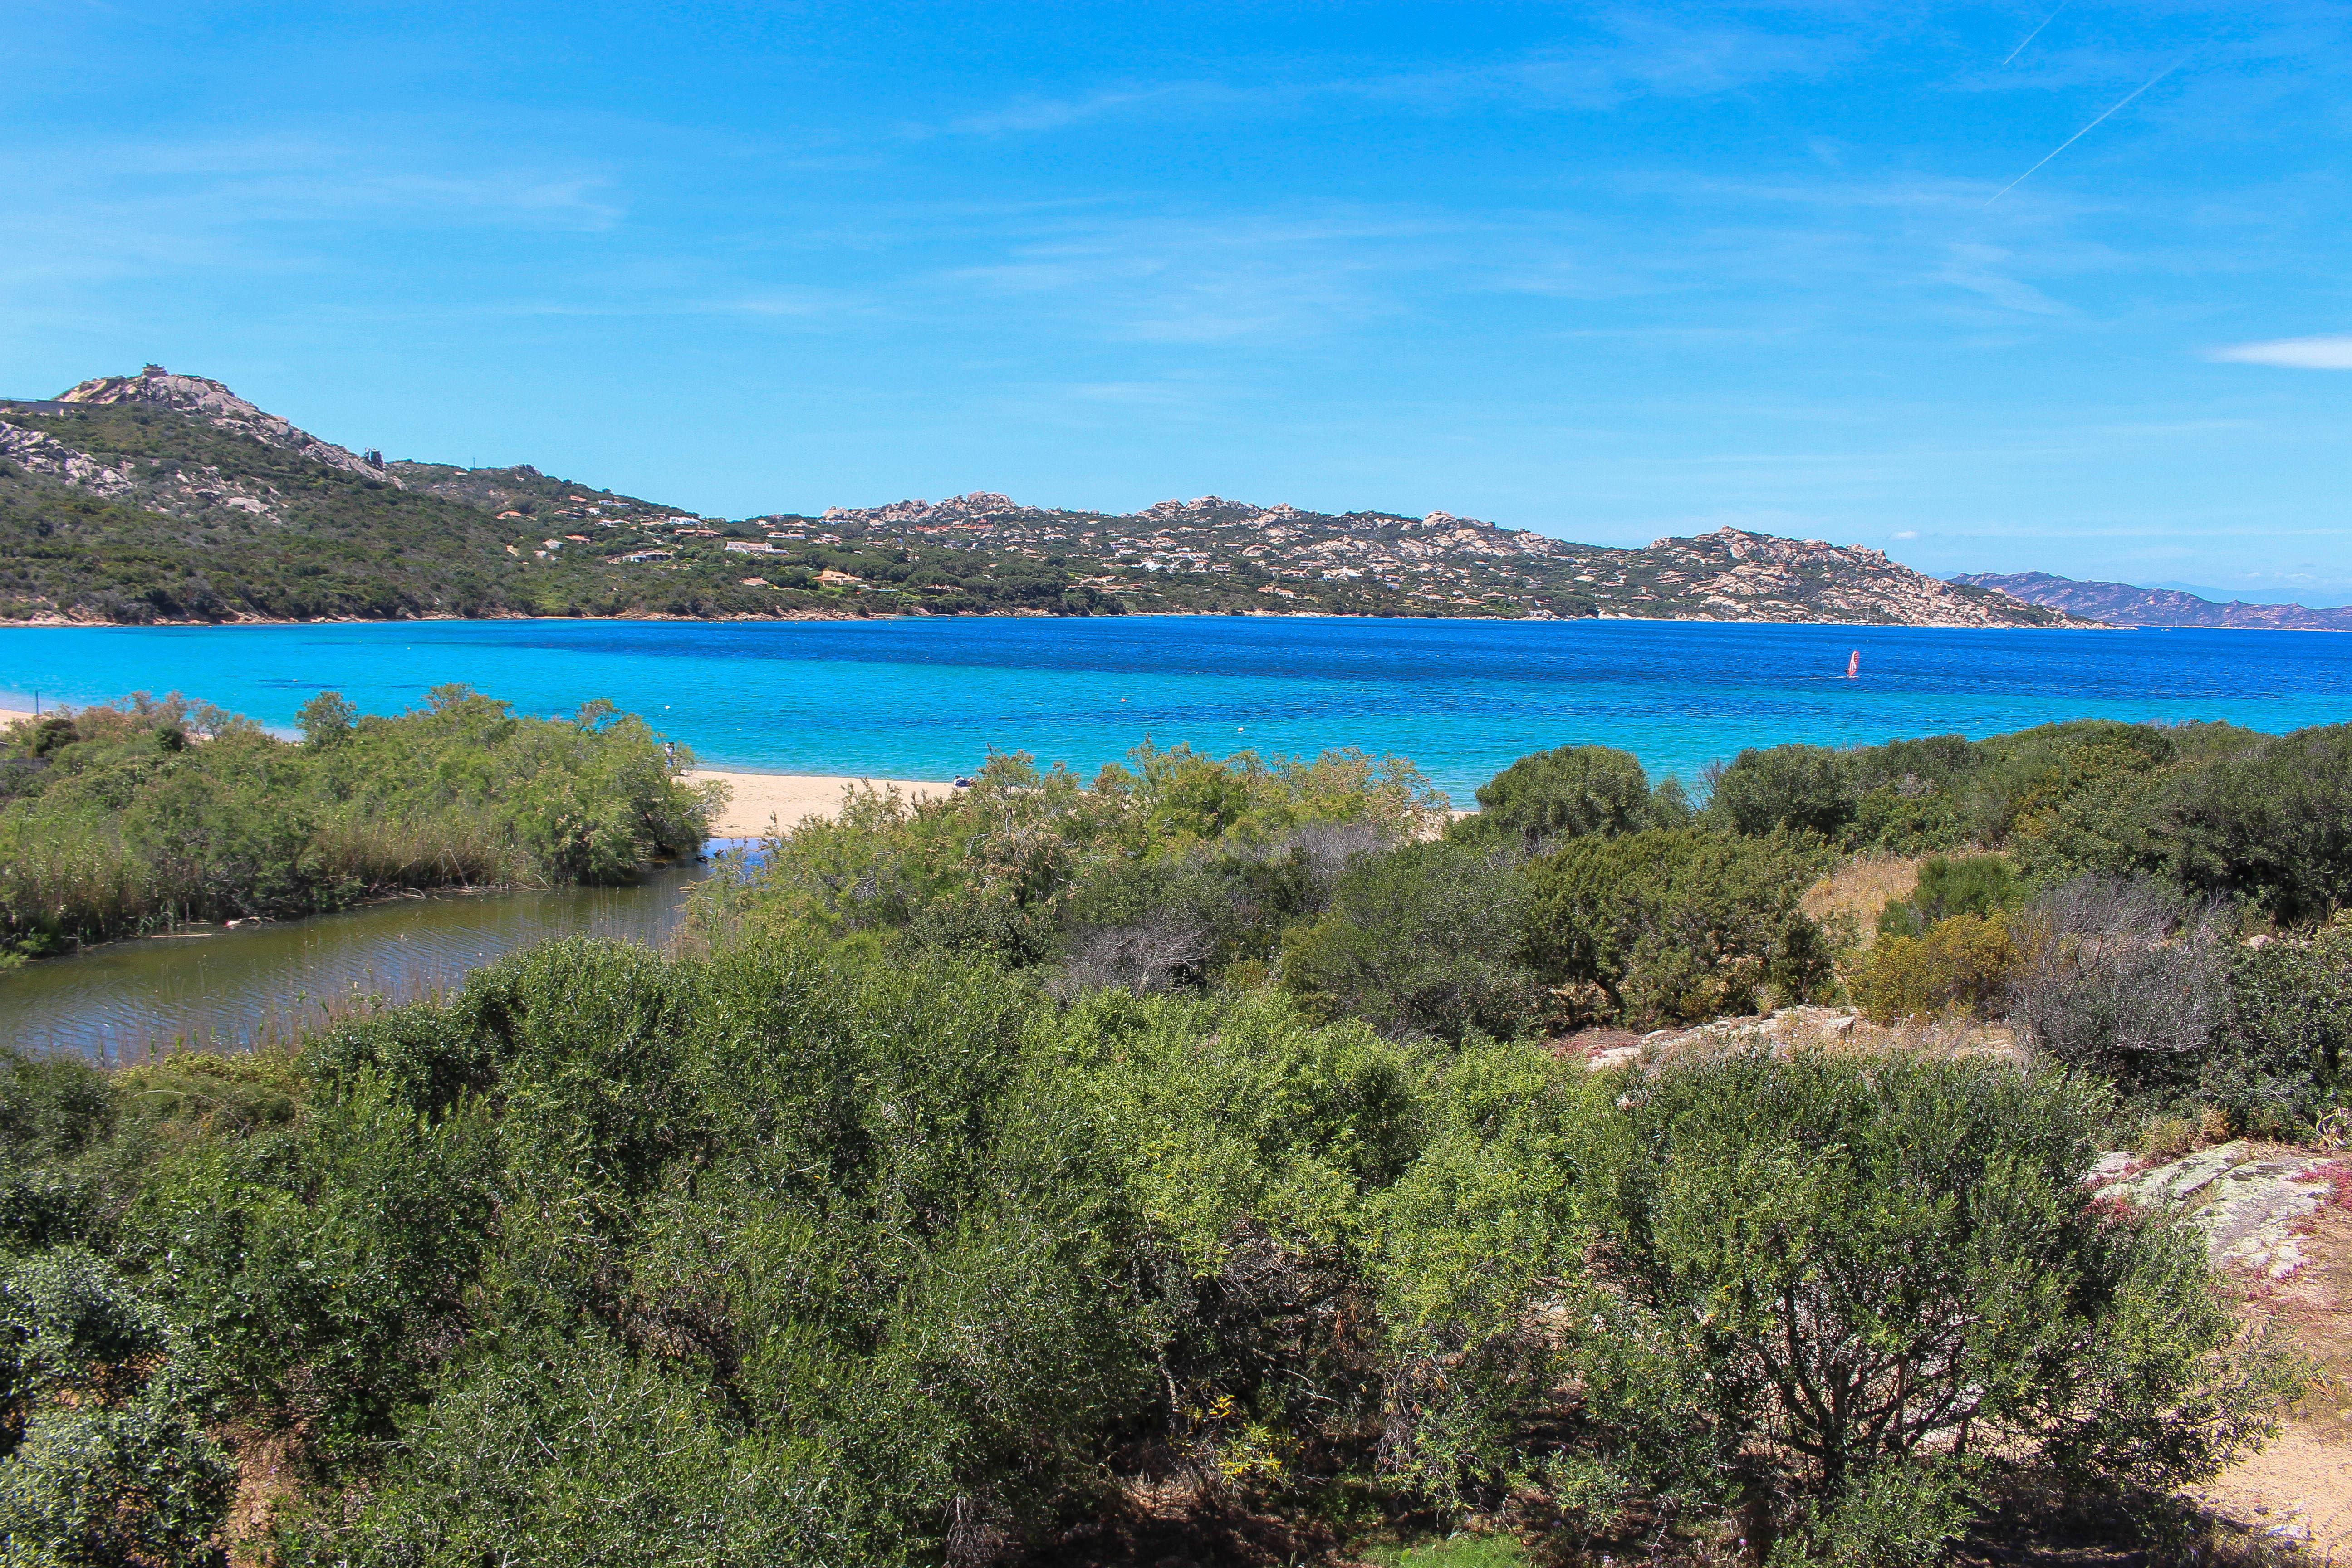 Strand bei Palau, Sardinien.